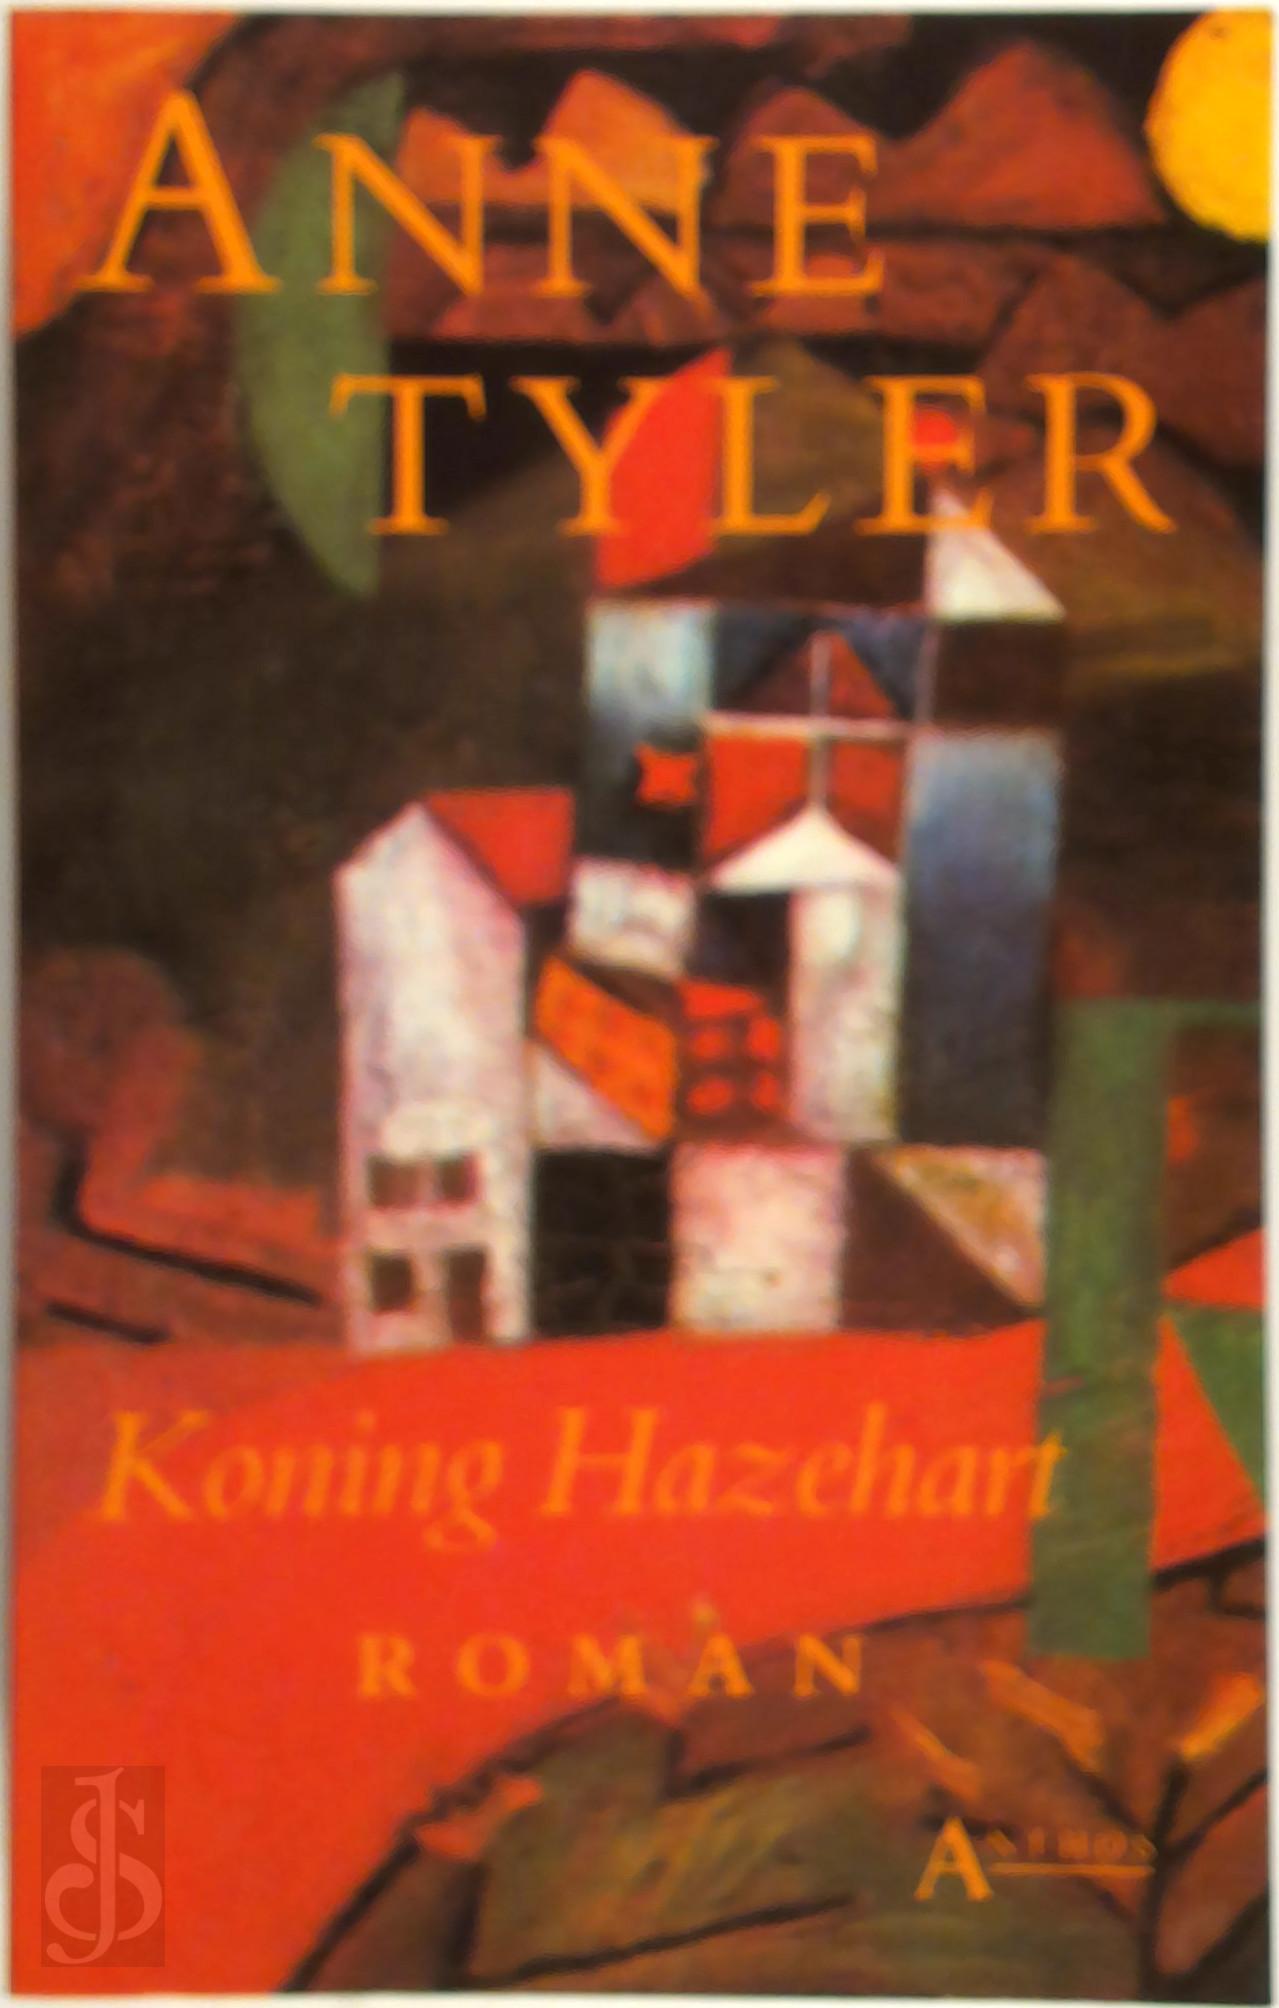 Tyler - Koning hazehart